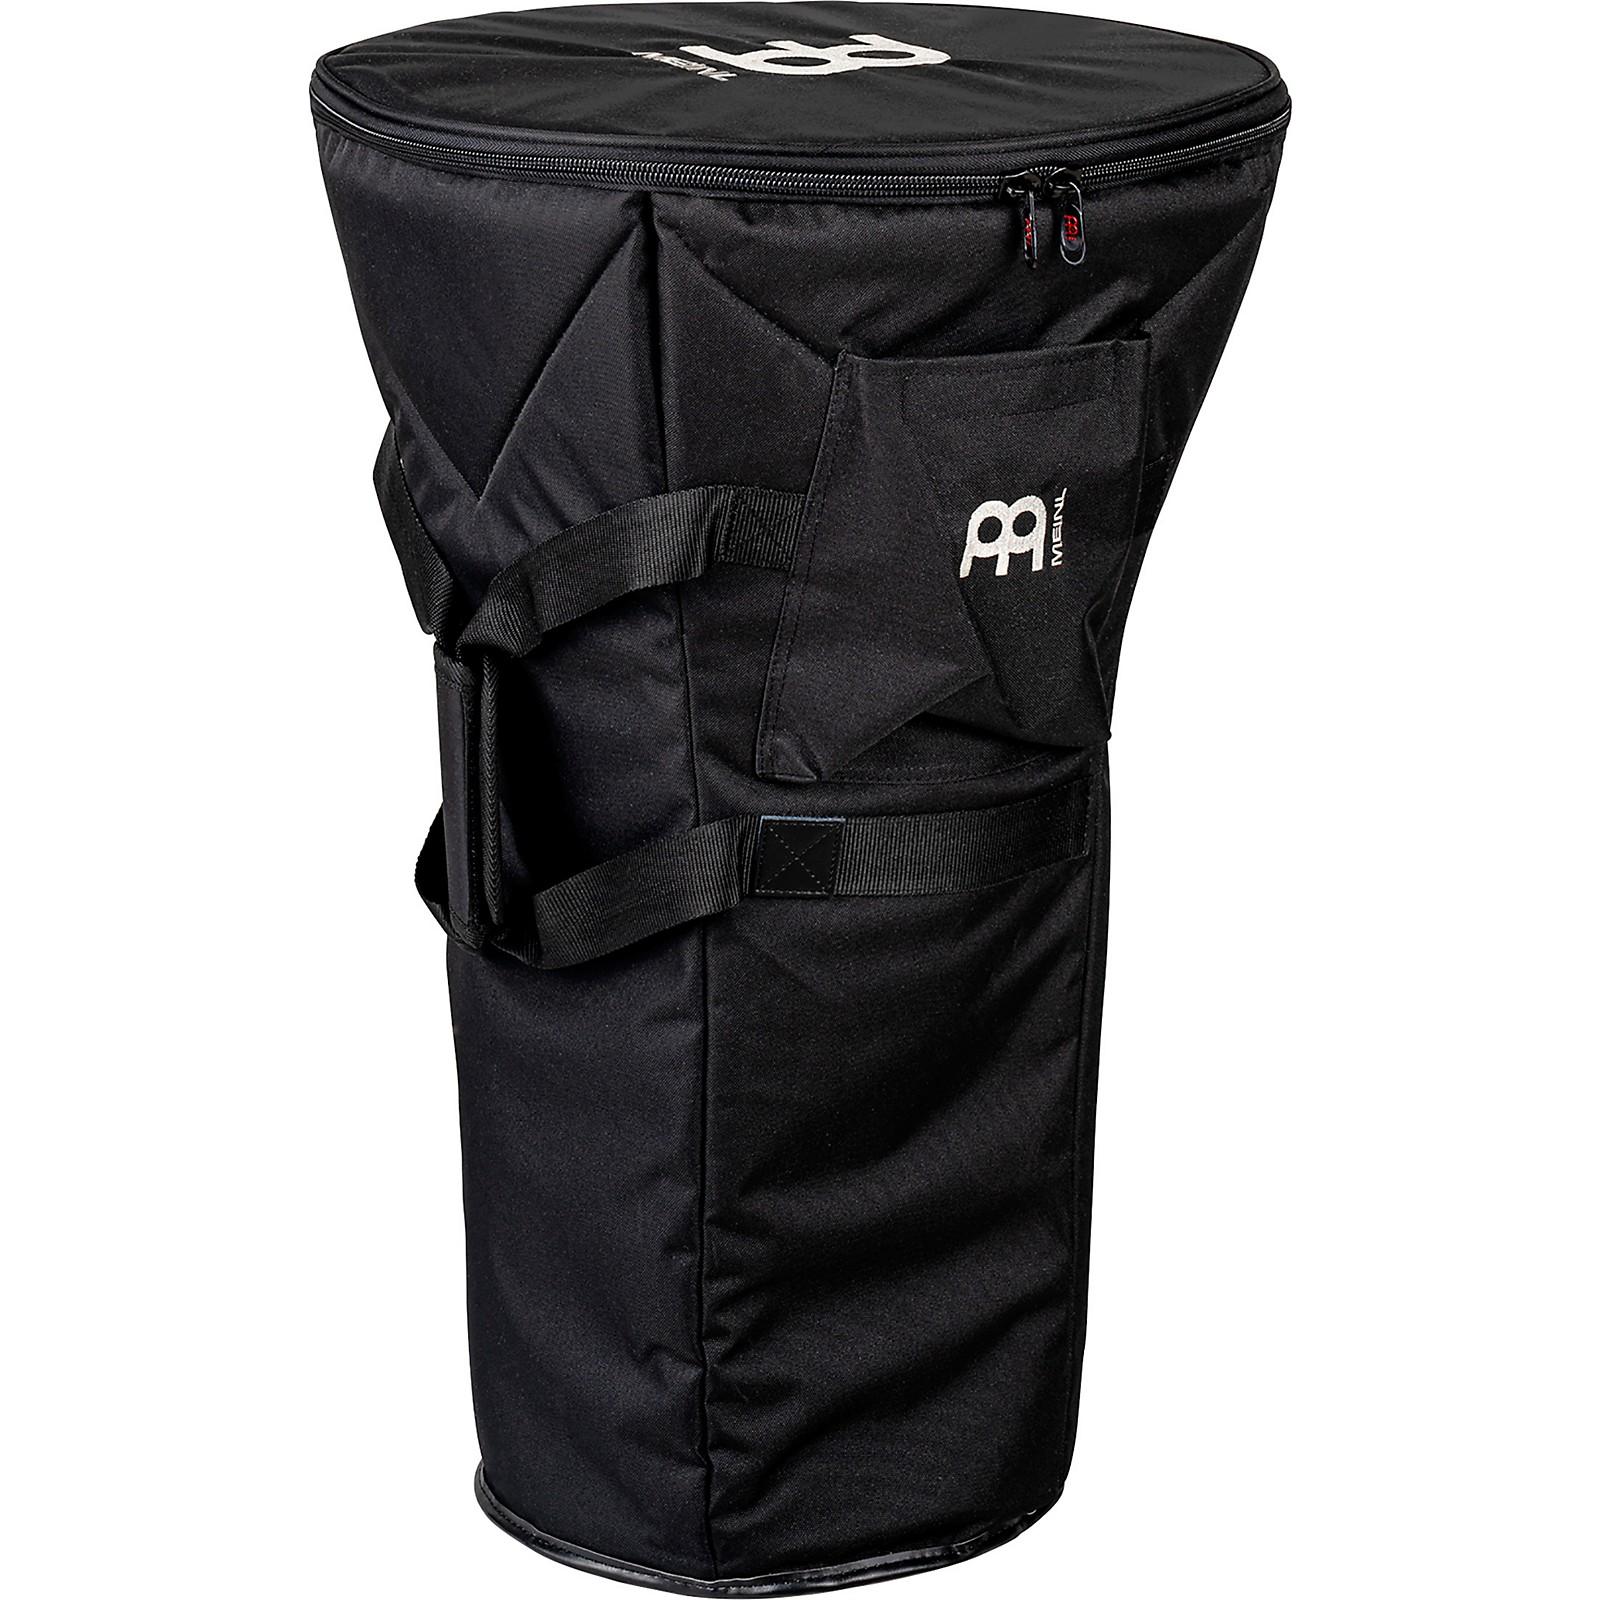 Meinl Deluxe Djembe Bag